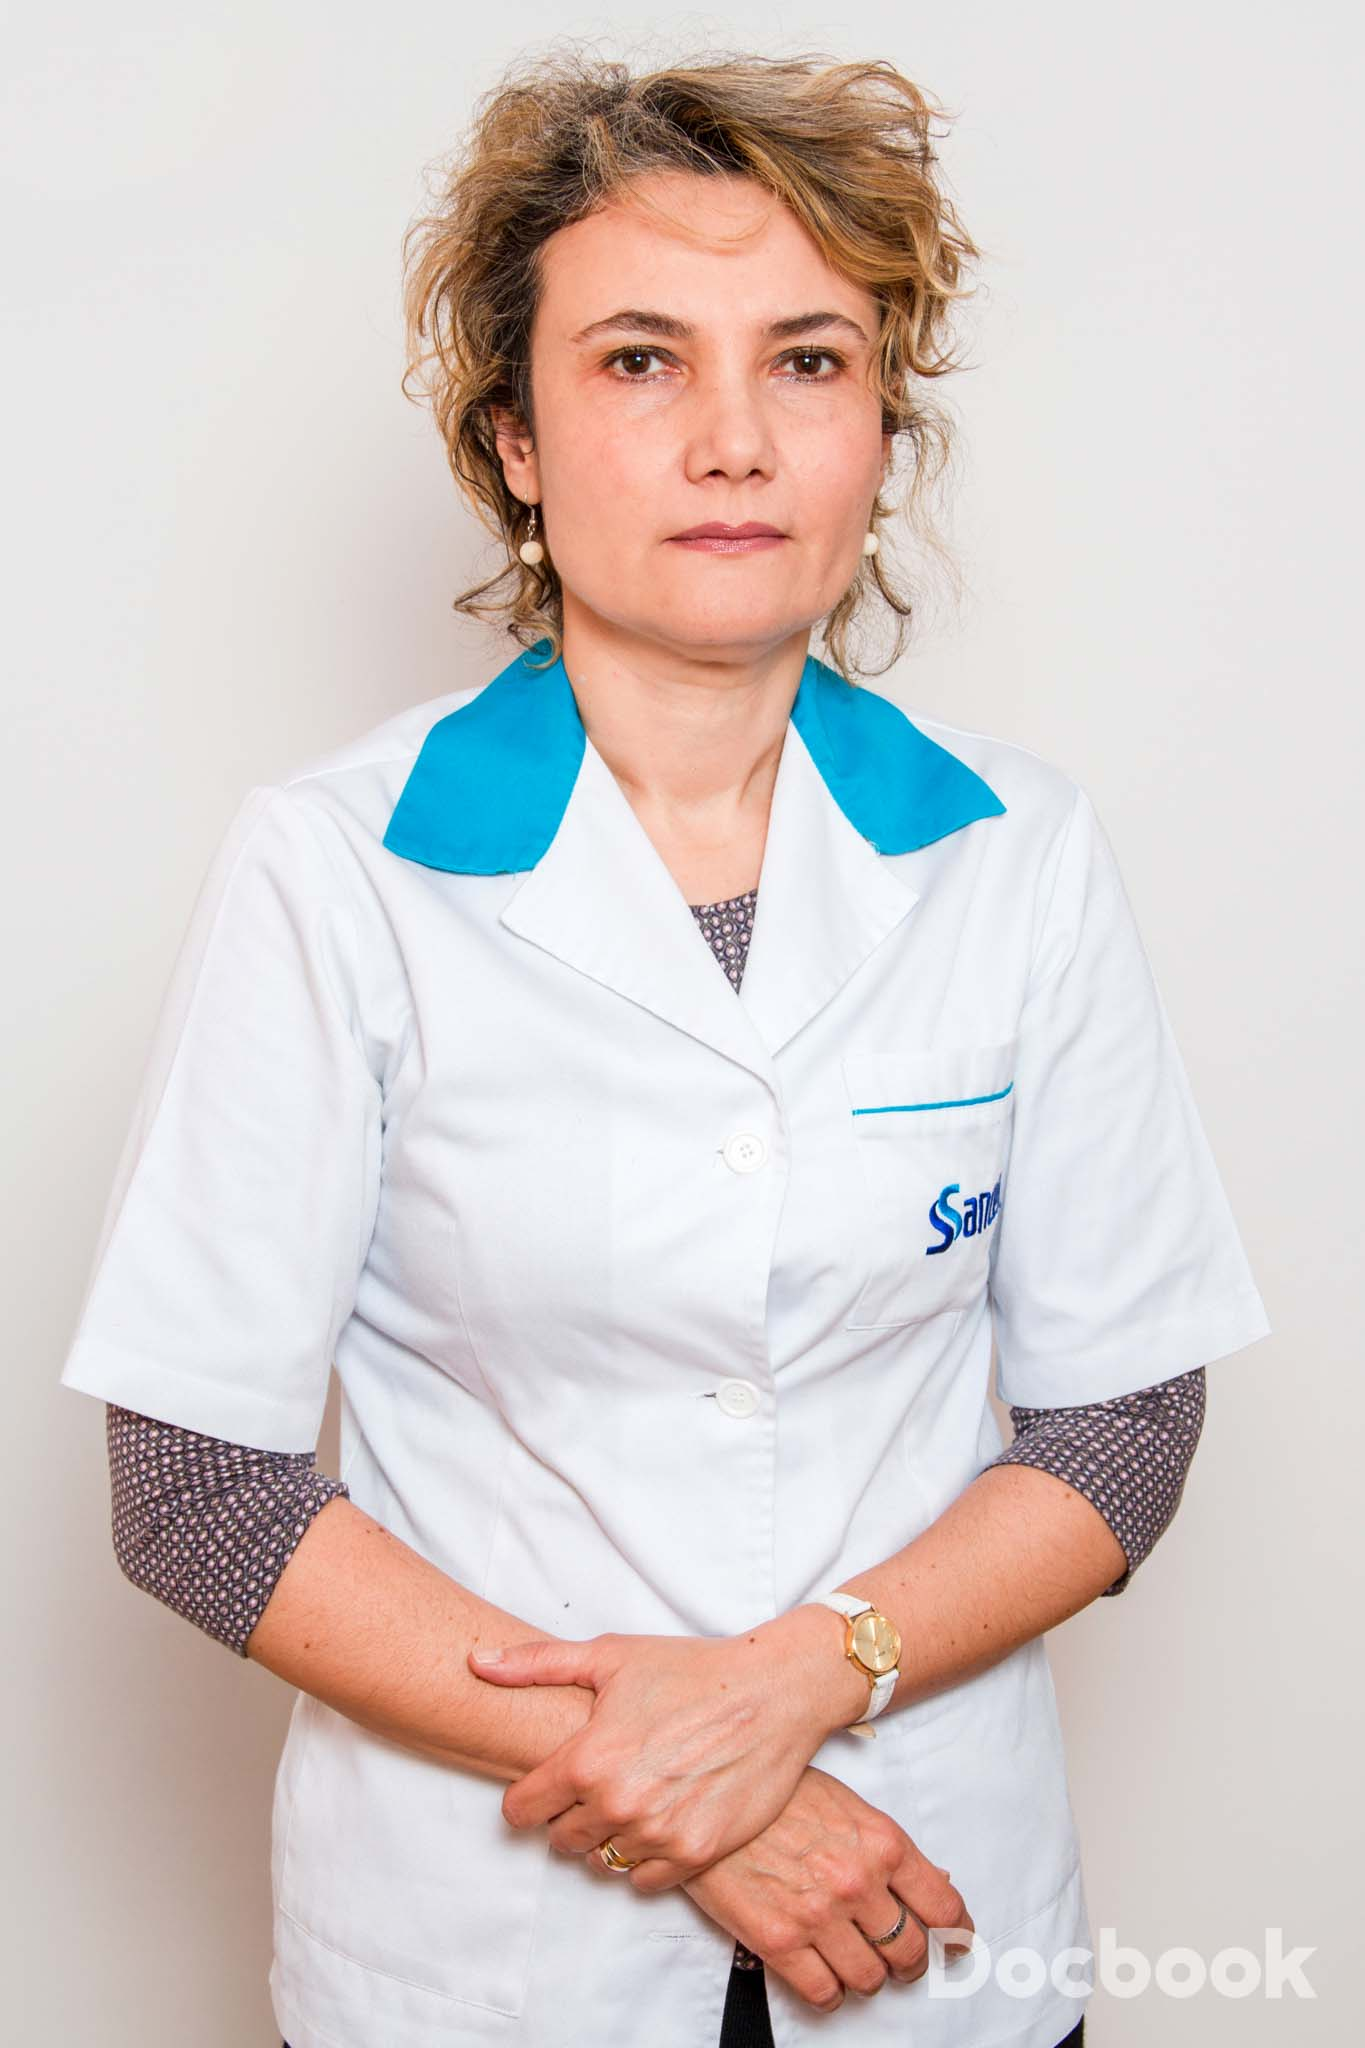 Dr. Madalina Palamariu